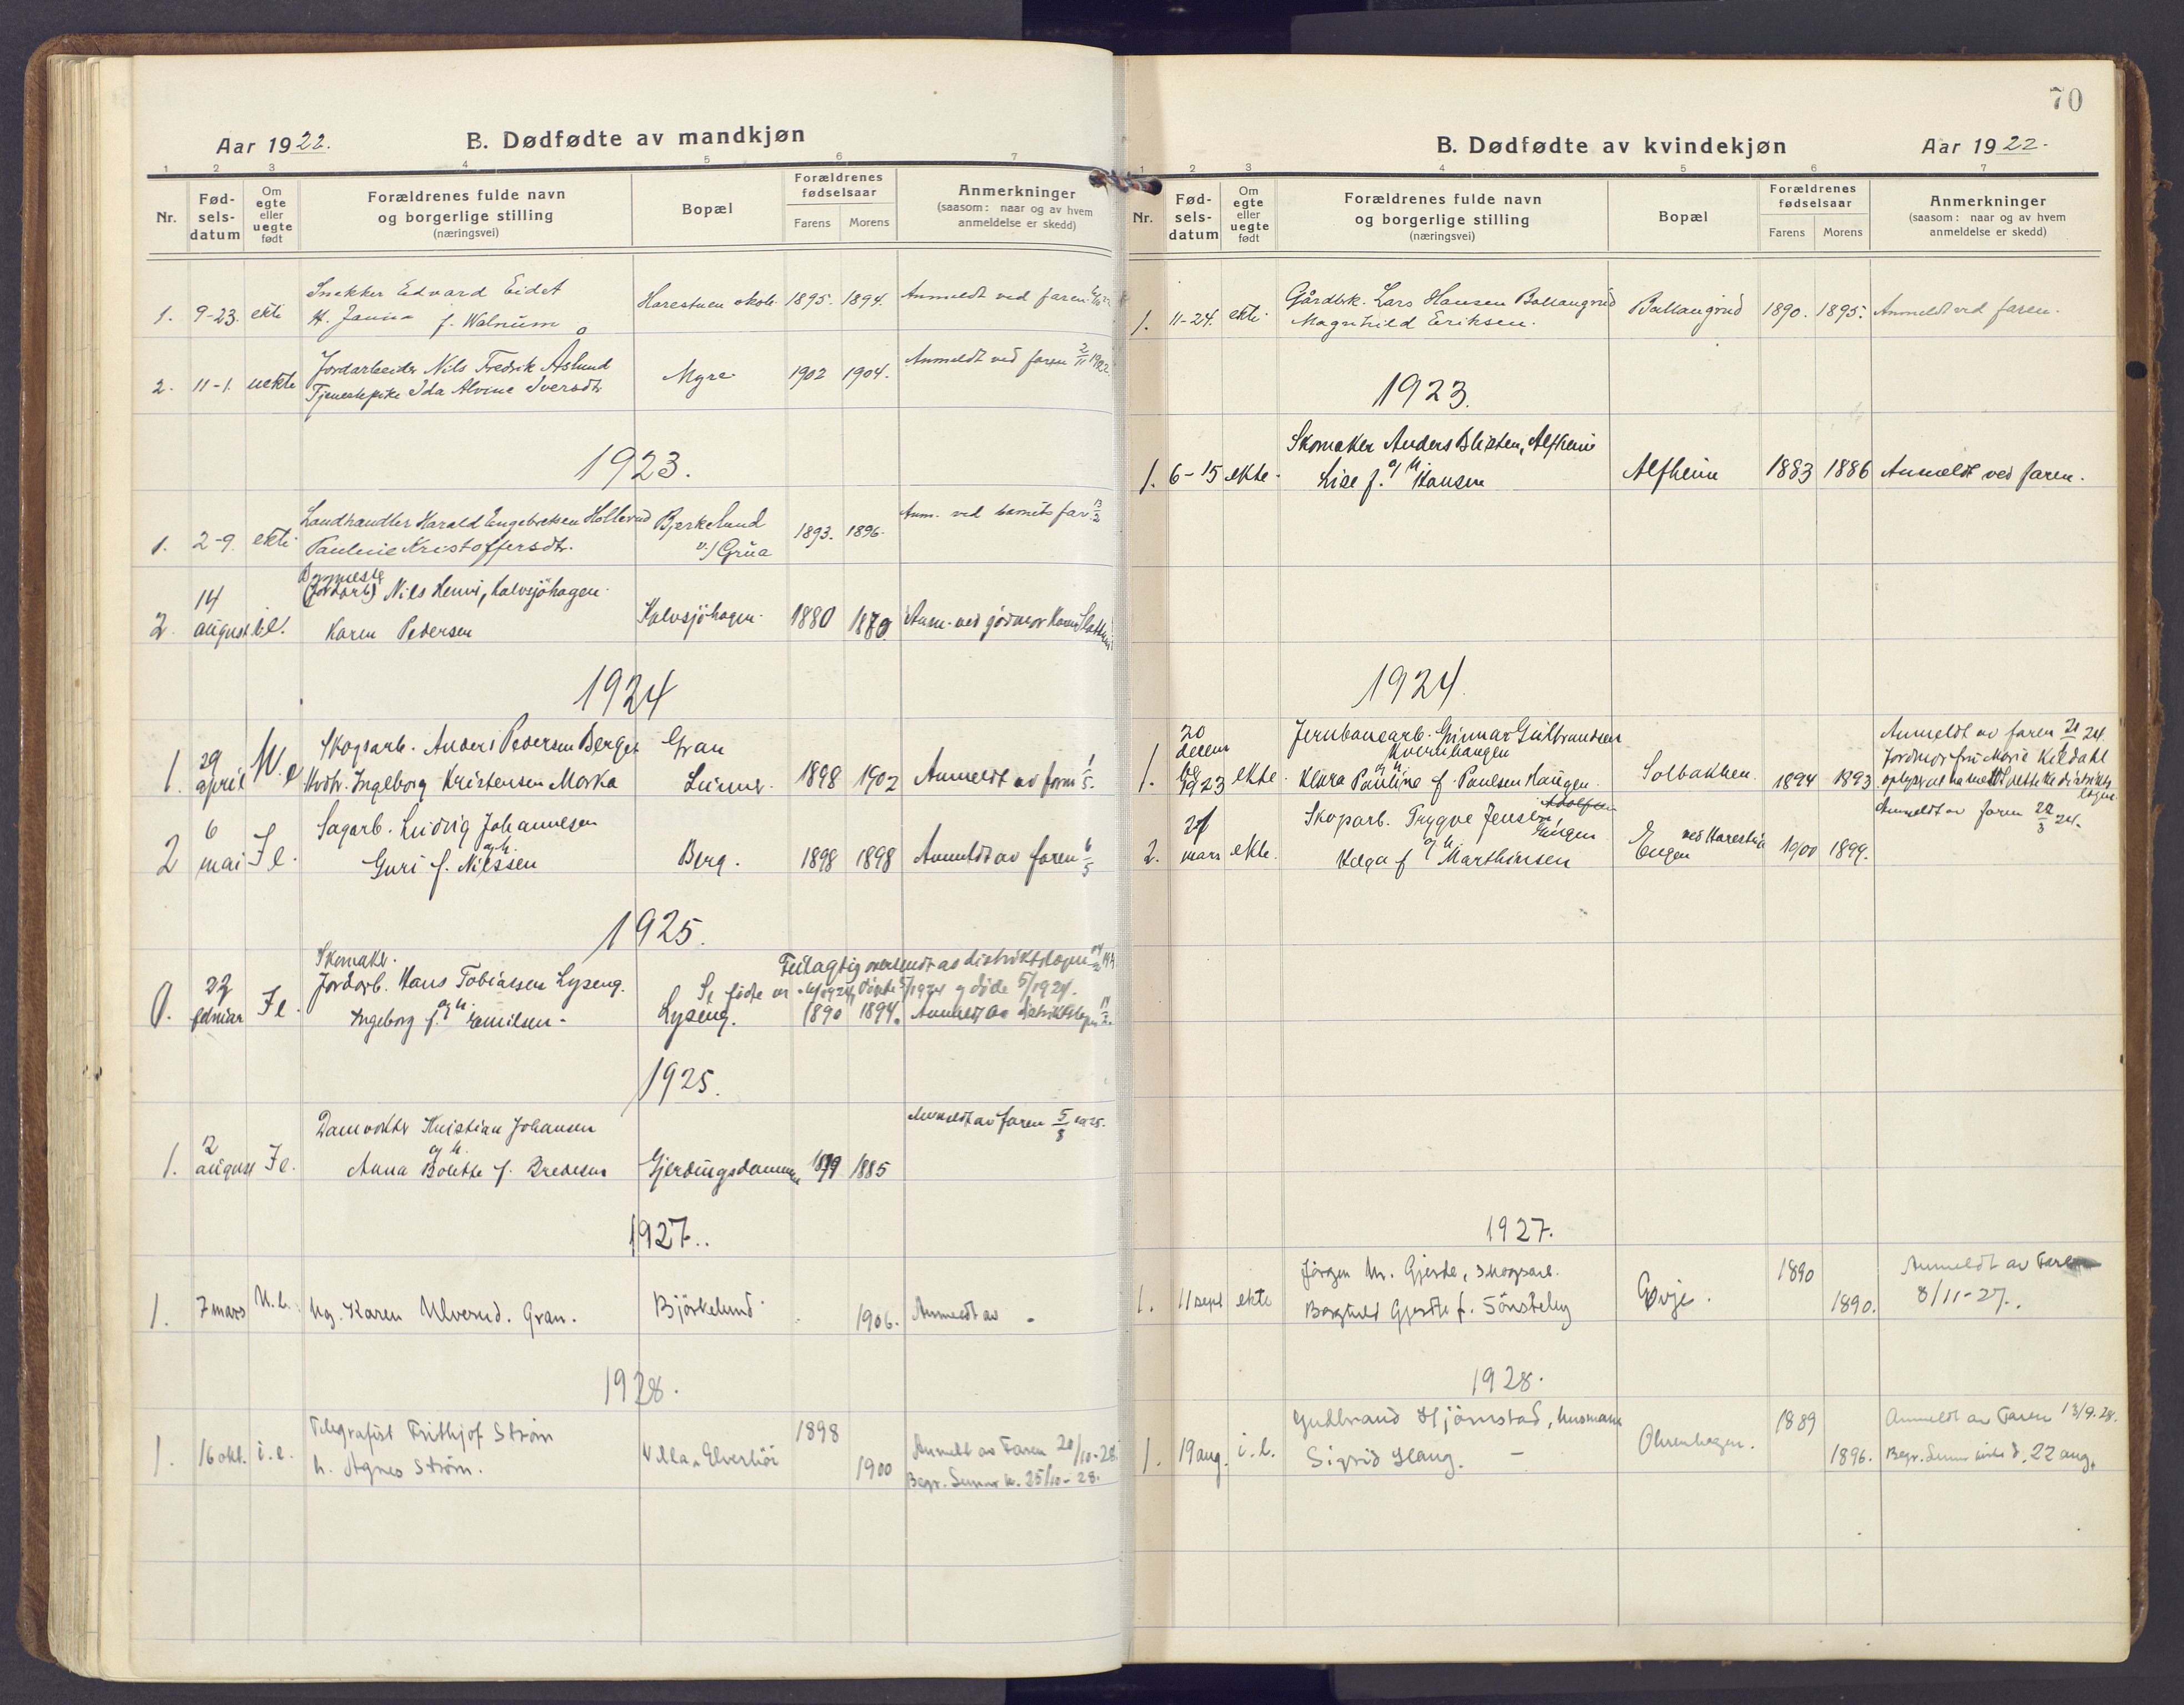 SAH, Lunner prestekontor, H/Ha/Haa/L0002: Ministerialbok nr. 2, 1922-1931, s. 70